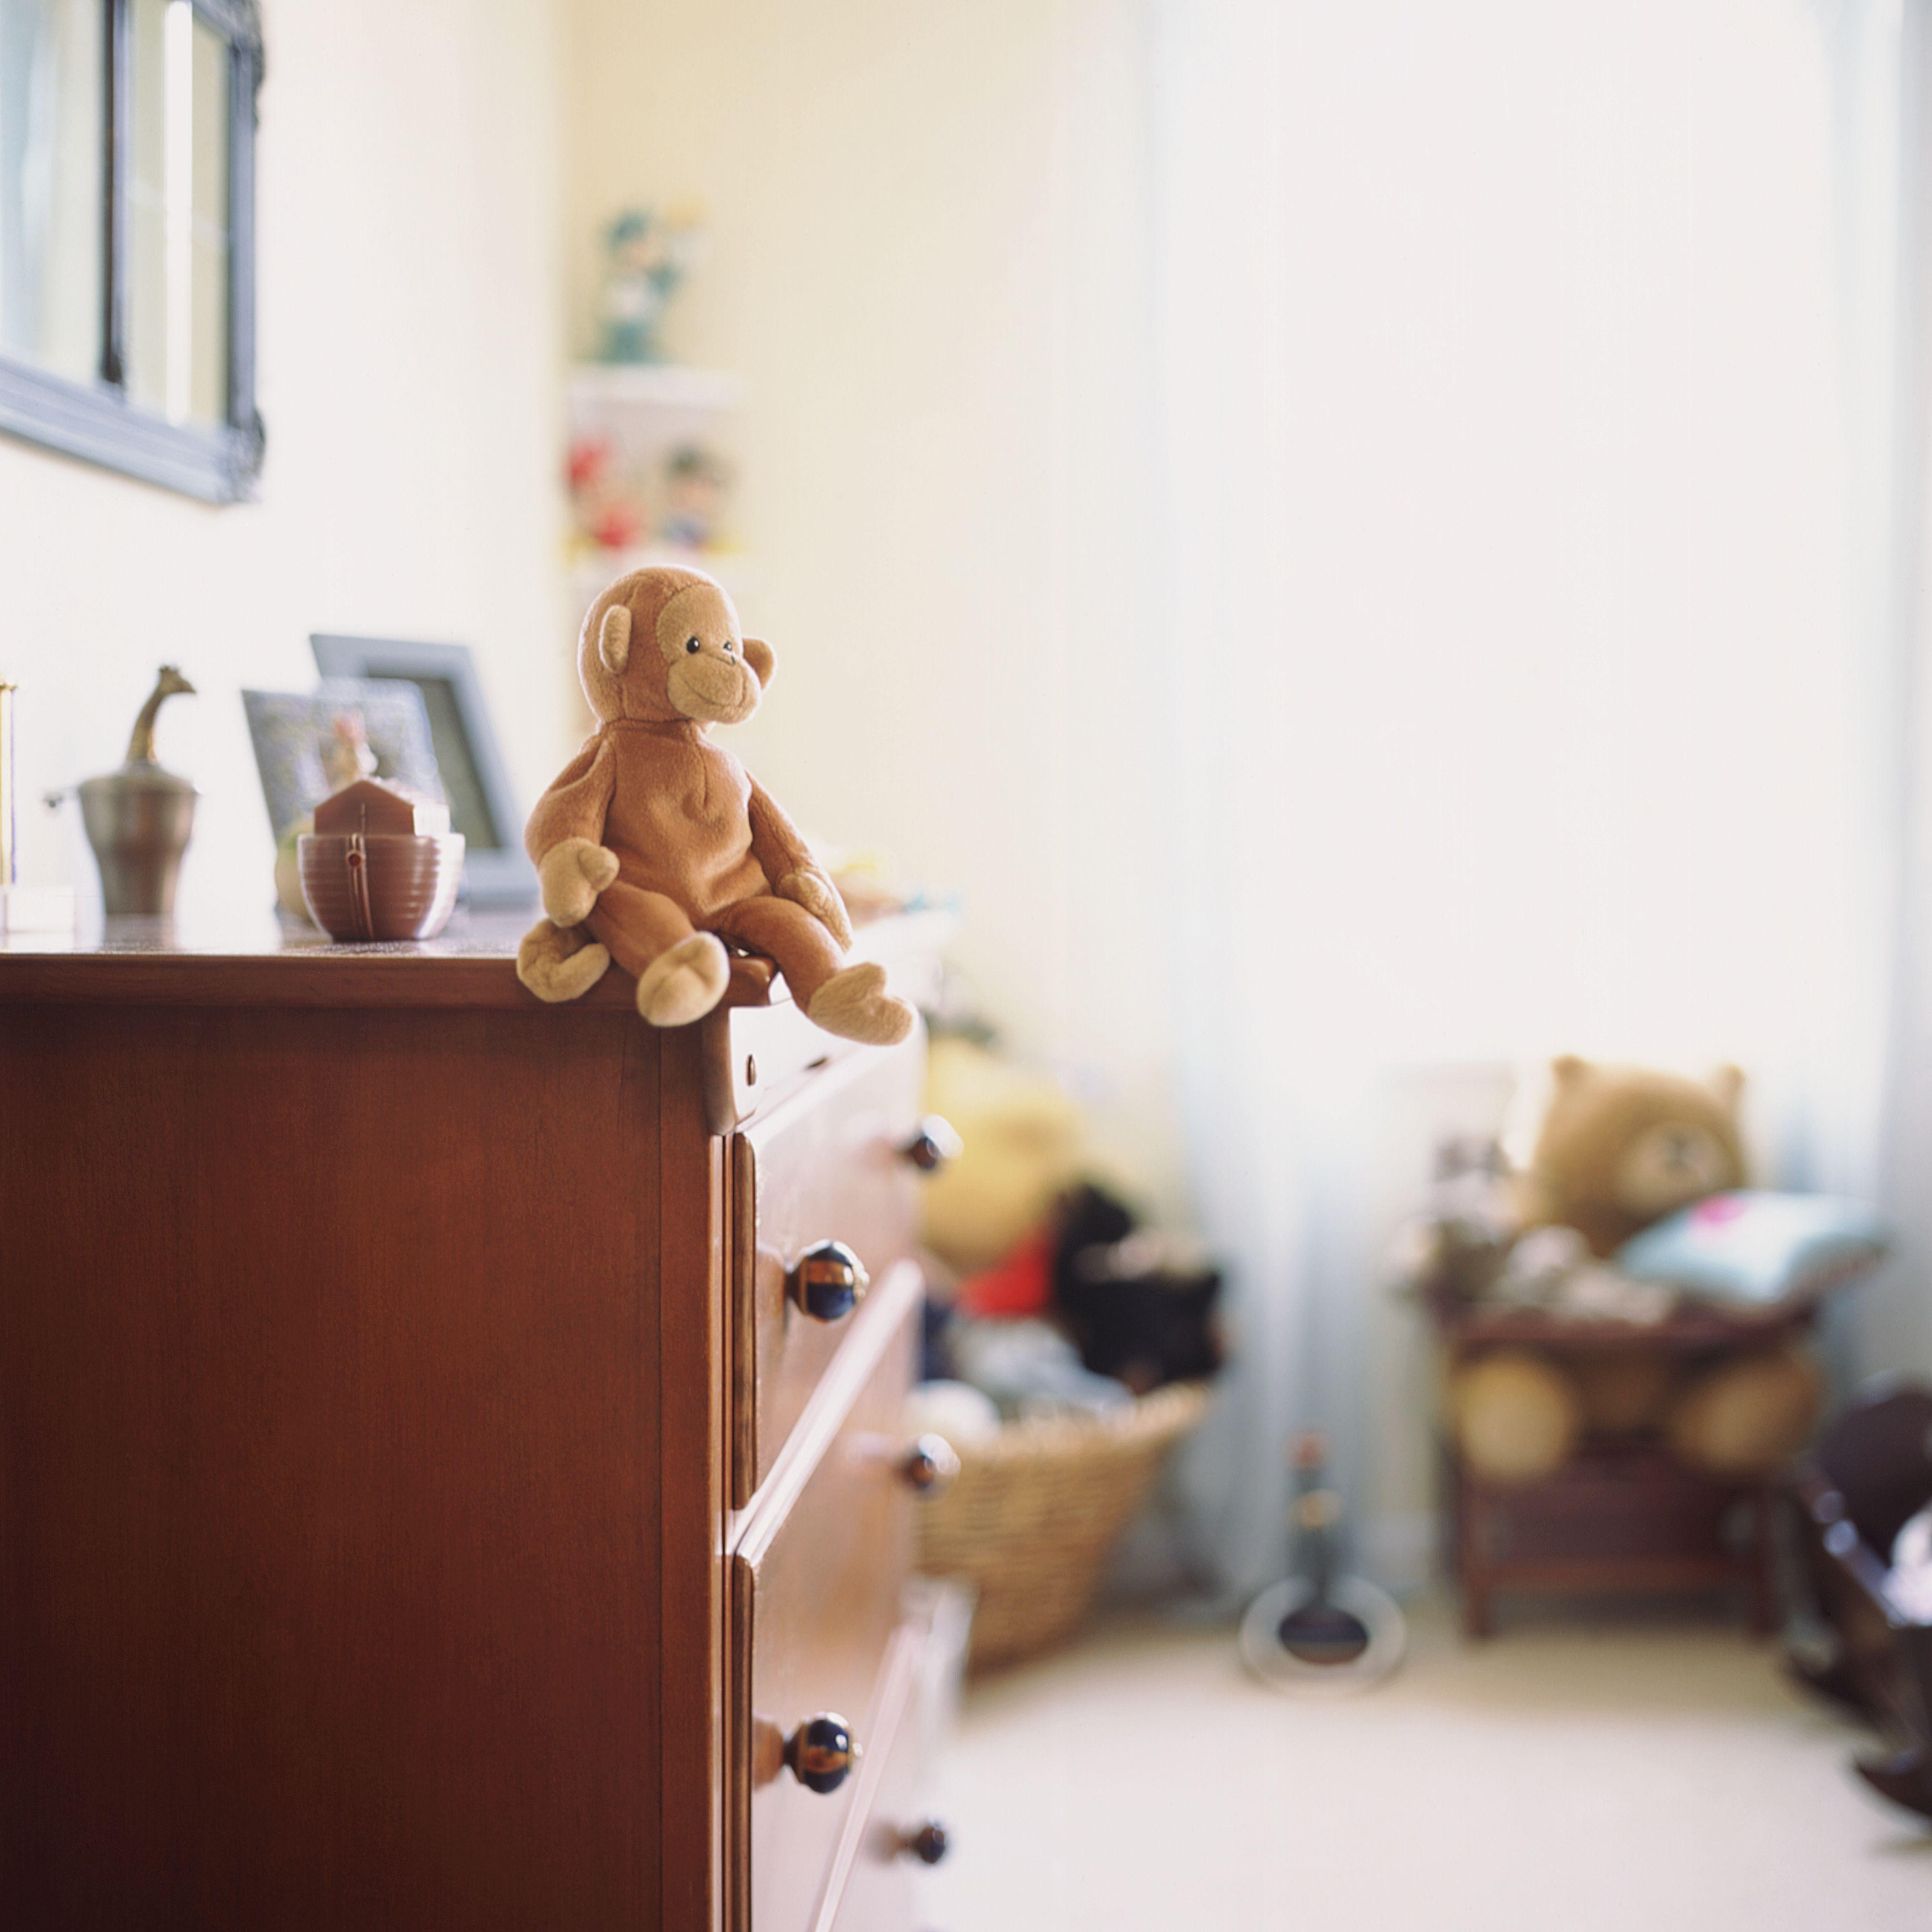 Child's bedroom (focus on stuffed toy on dresser)